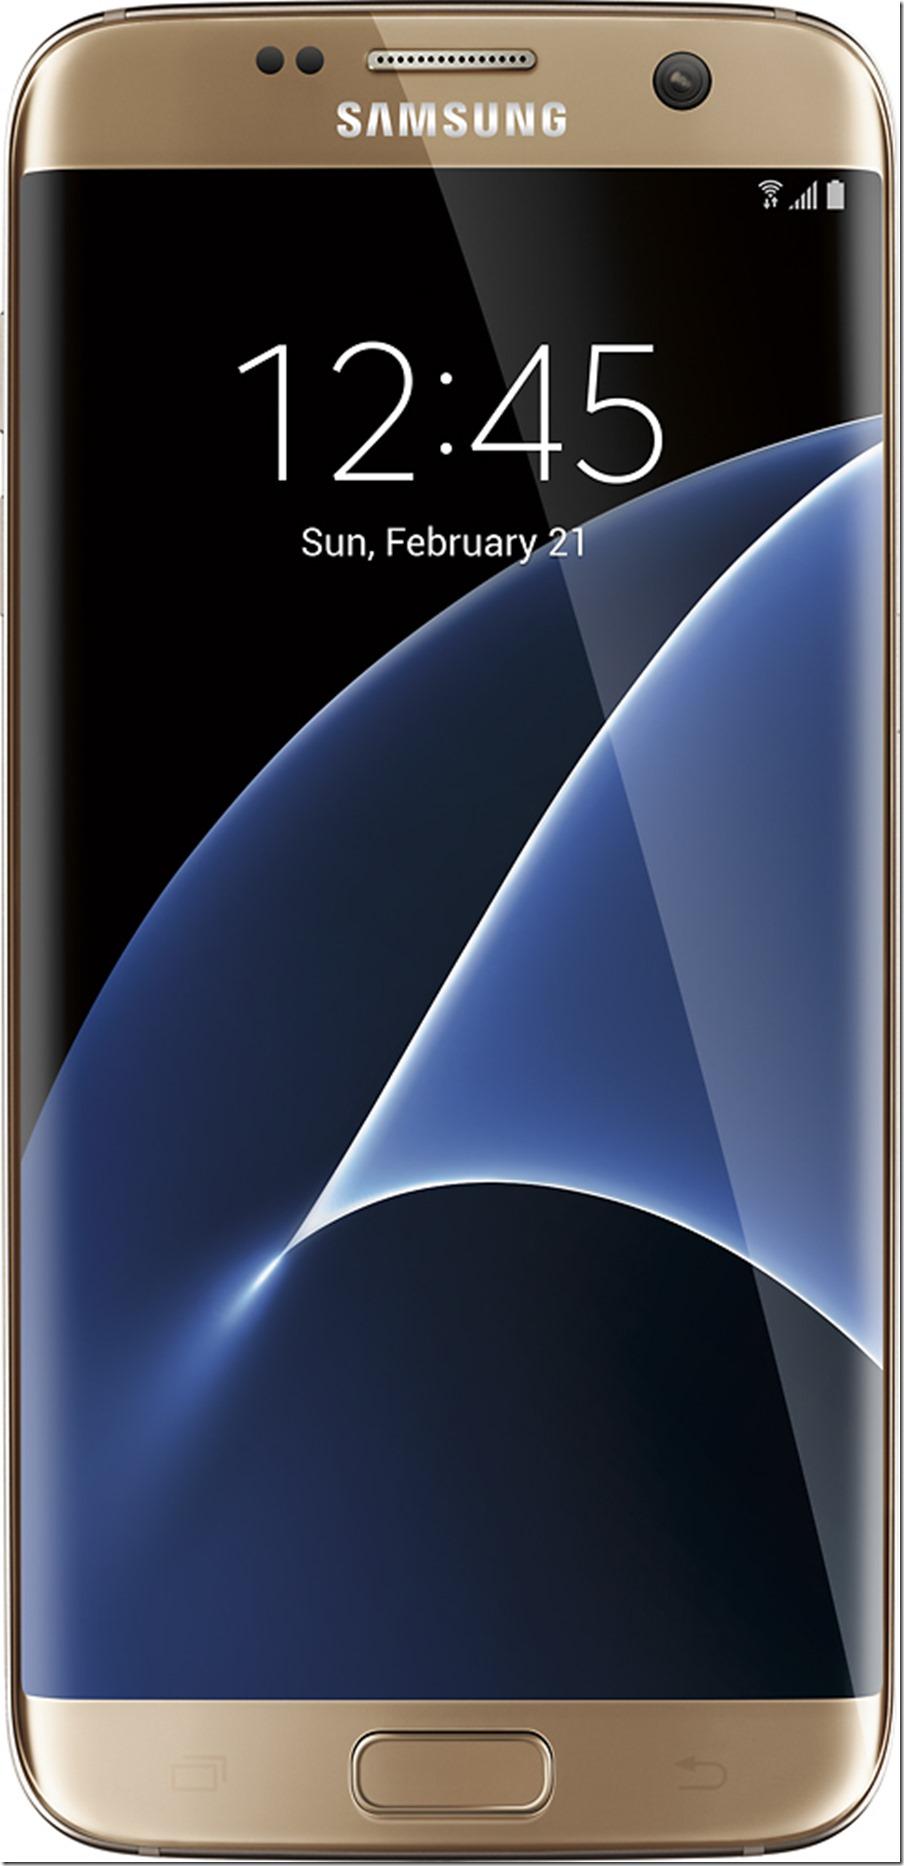 Samsung%20Mobile%20June